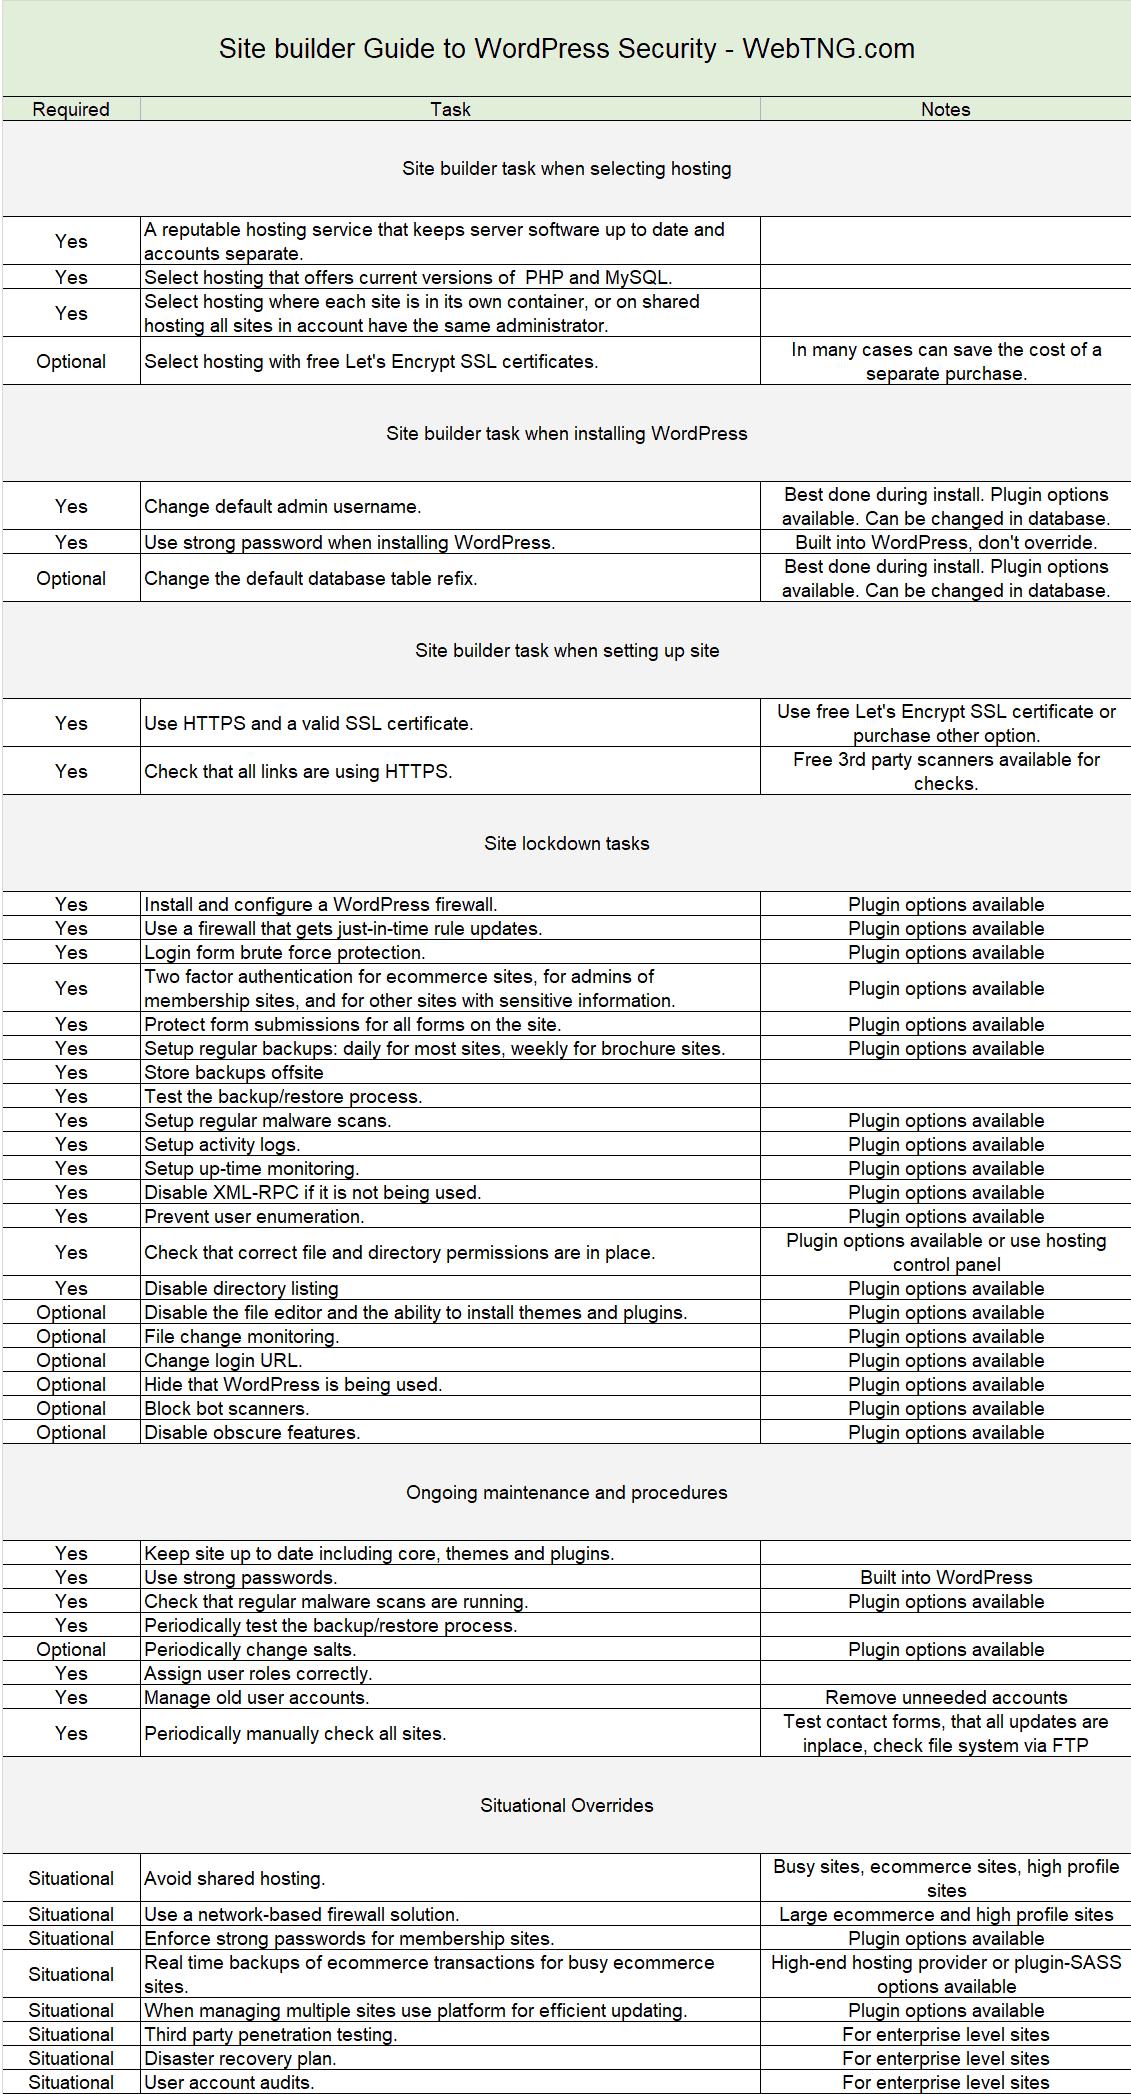 site builder guide to wordpress security webtng